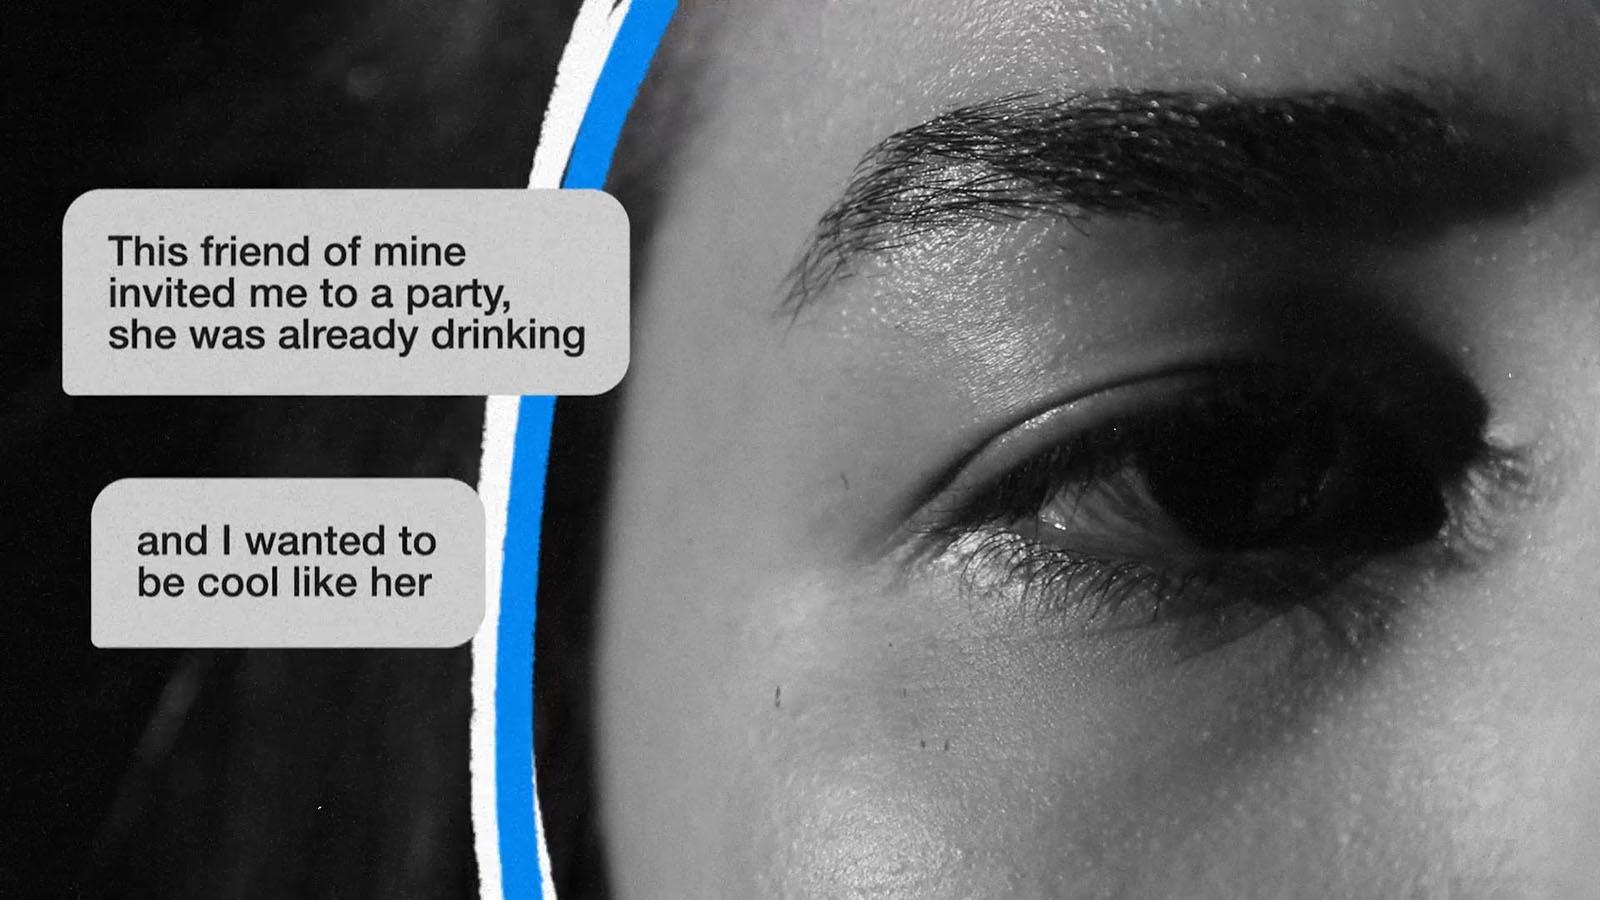 Anonymous Friend: เฟซบุ๊คแชทบอท ชวนวัยรุ่นติดเหล้าคุยแก้ปัญหาแบบ 'ไม่รู้หน้า-แต่รู้ใจ'